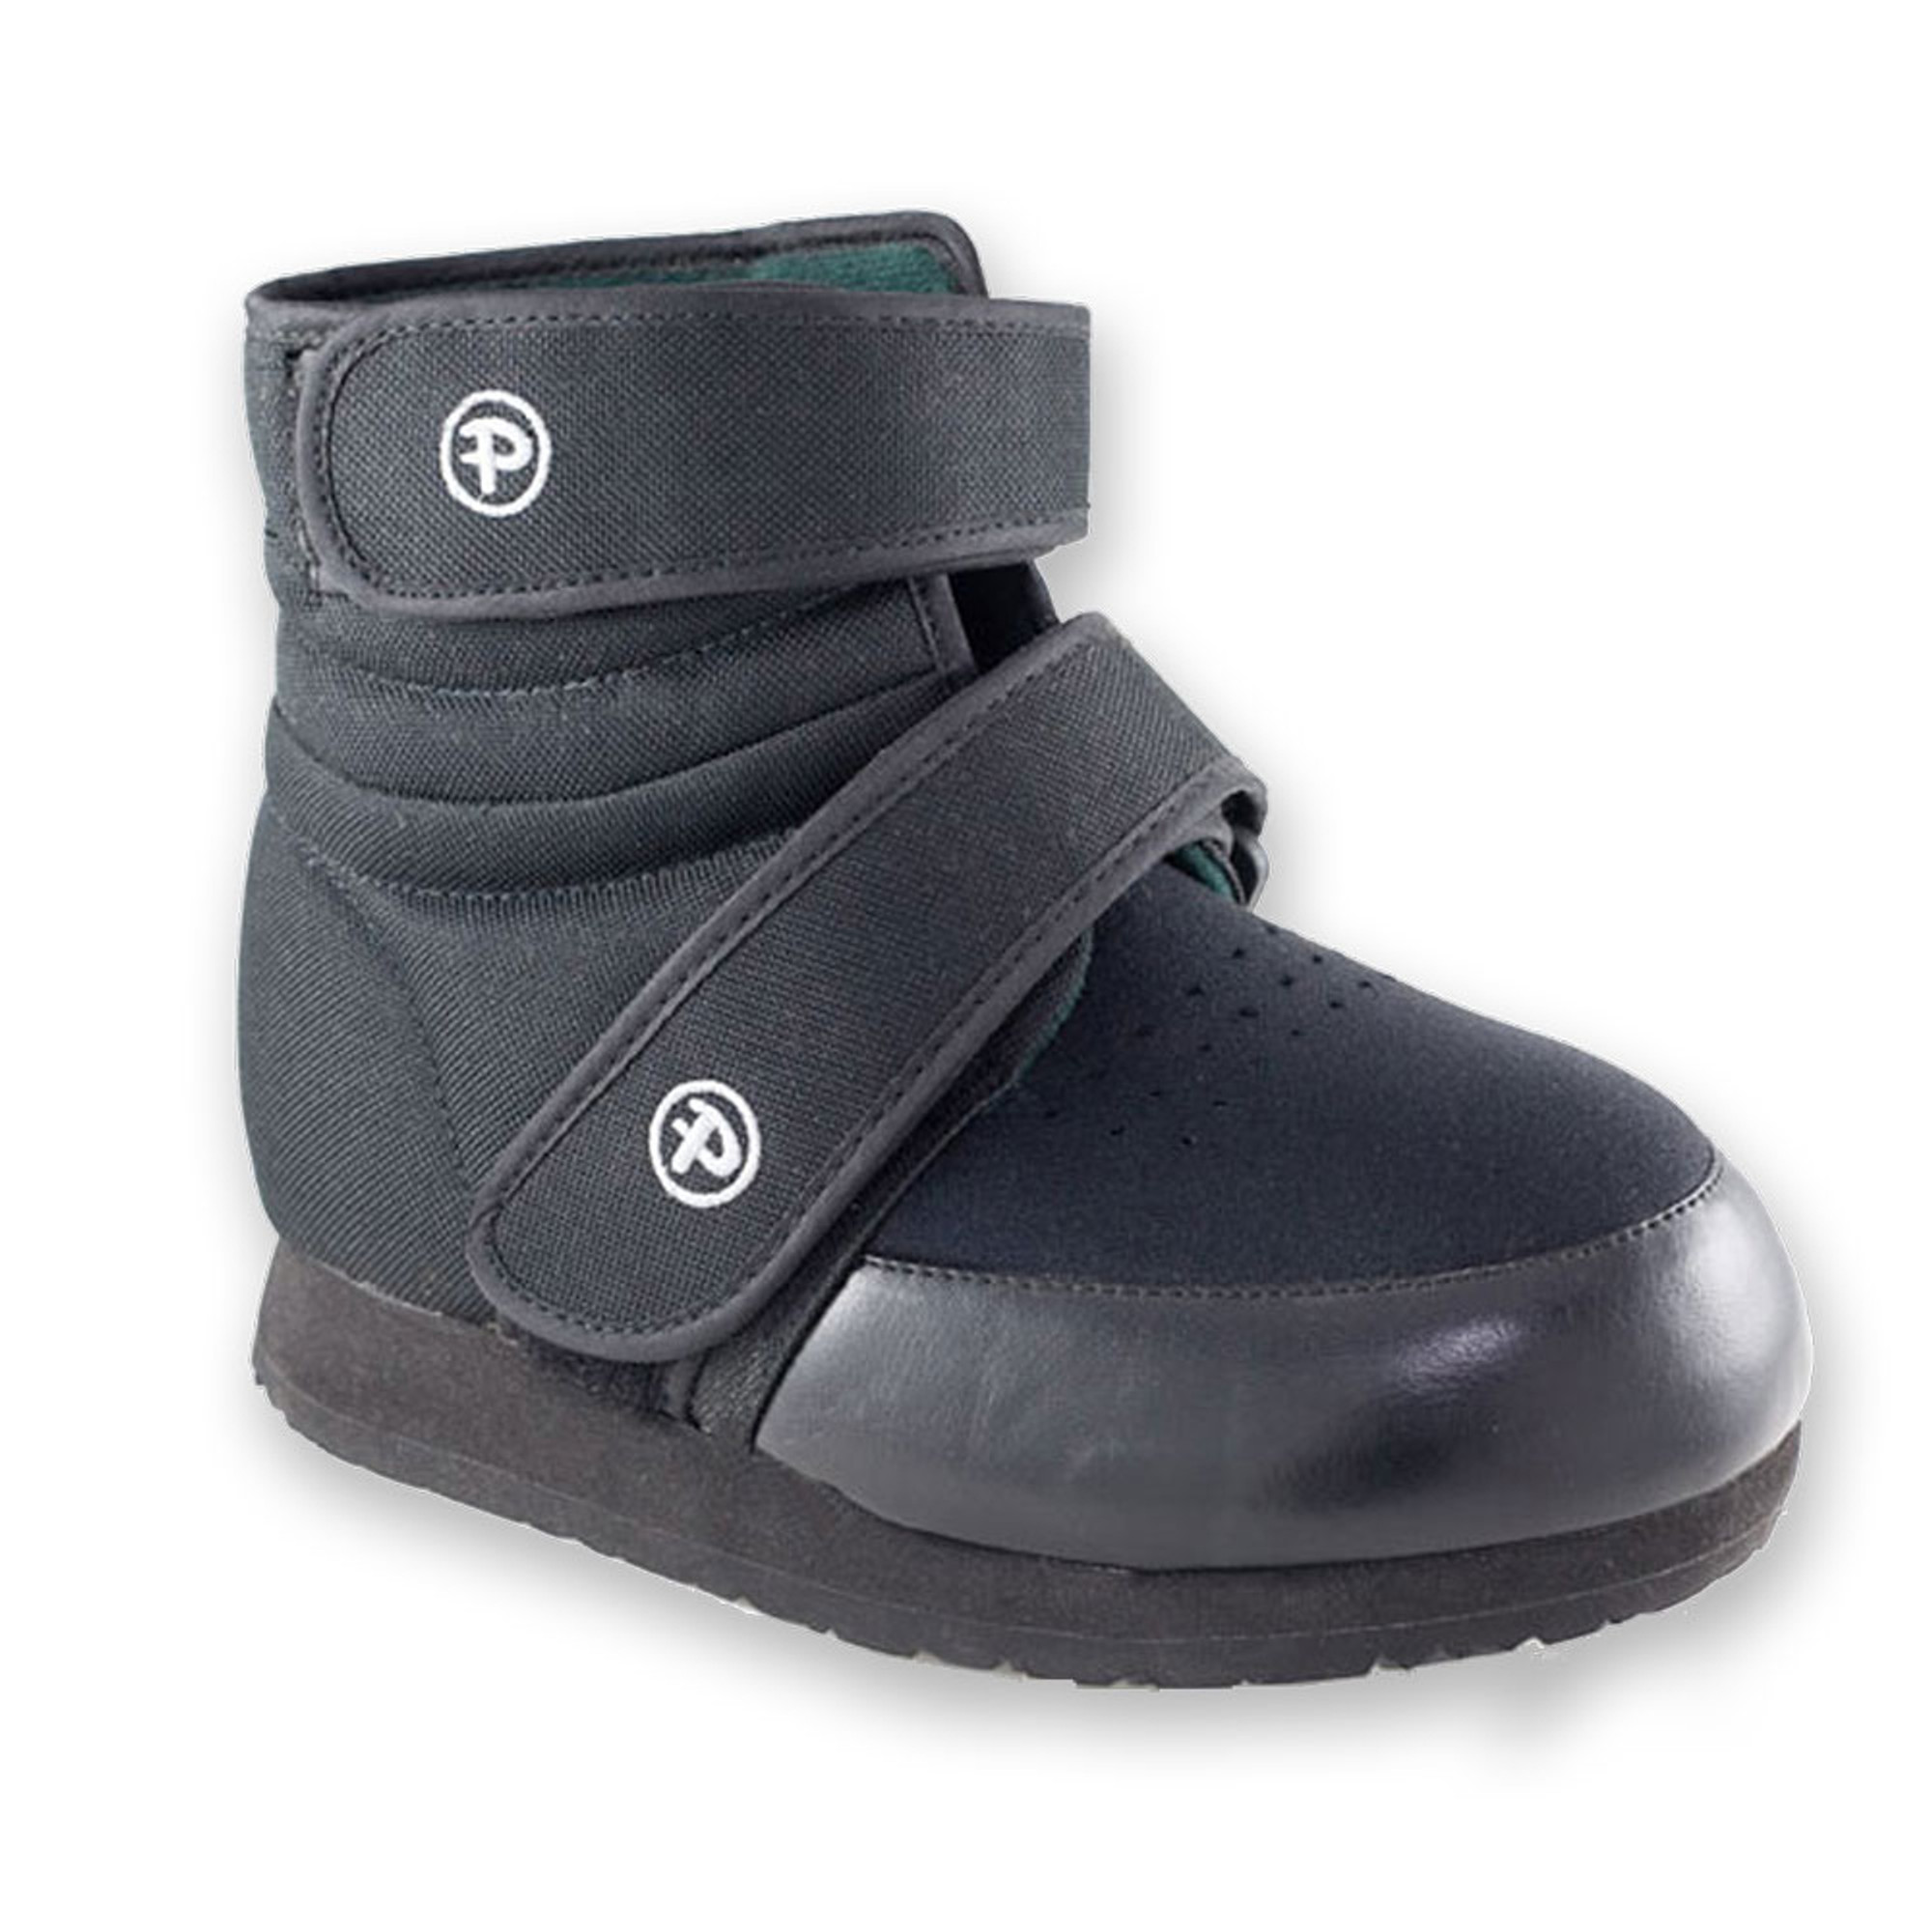 Pedors High Top Black Orthopedic Boot | Wide | Deep